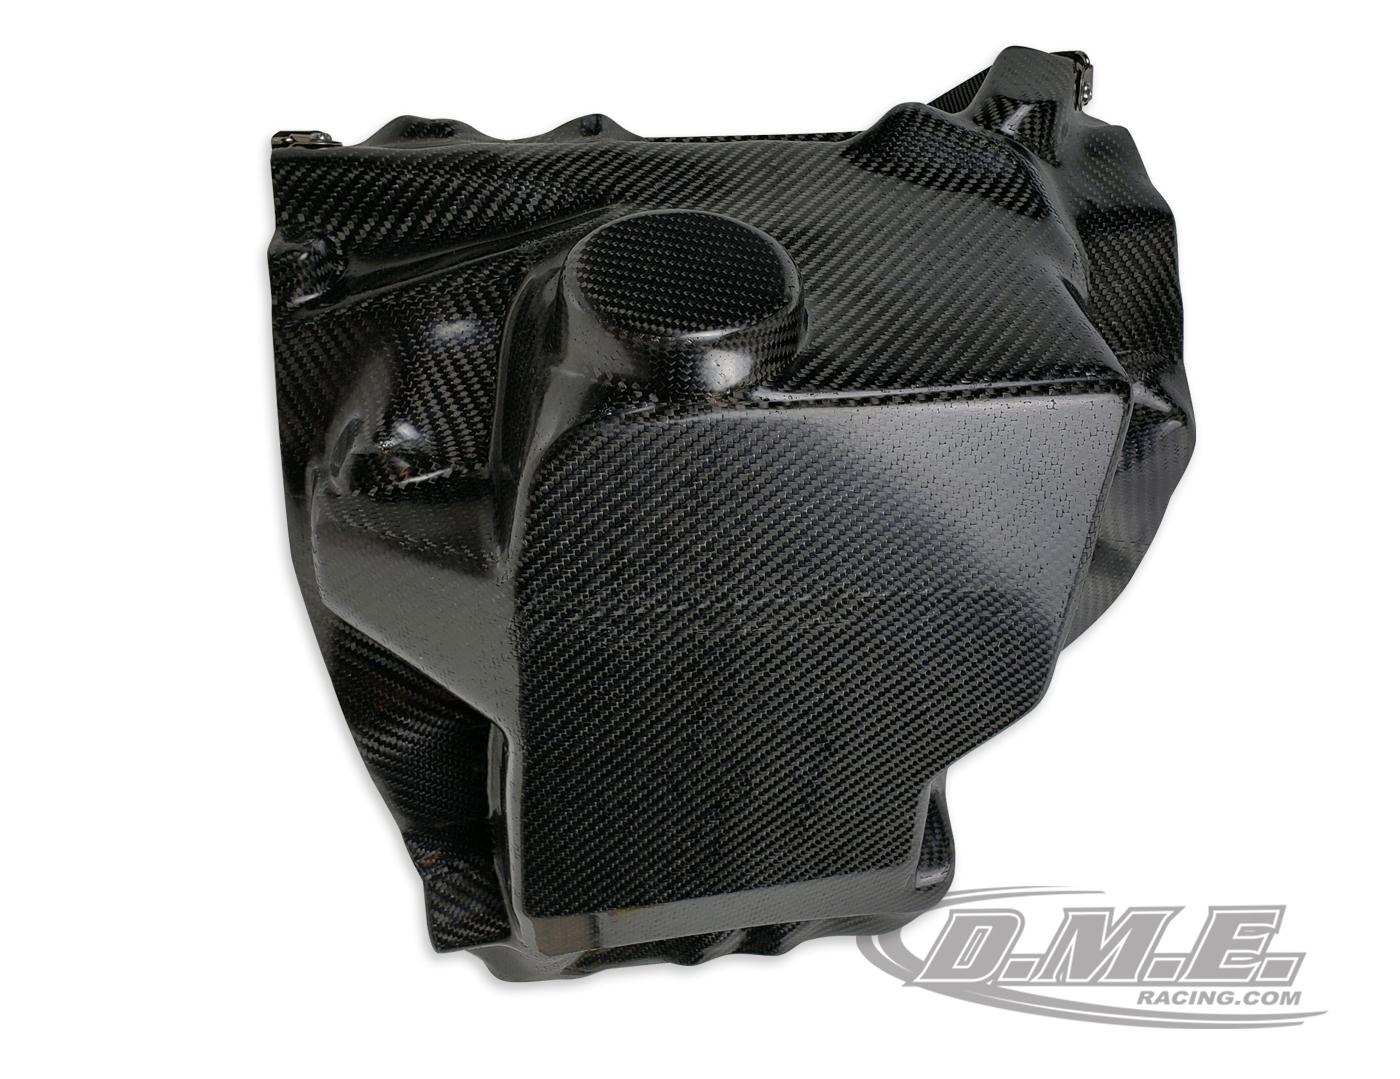 DME Racing Lower Engine Restraint - Carbon Fiber | Engine Diaper